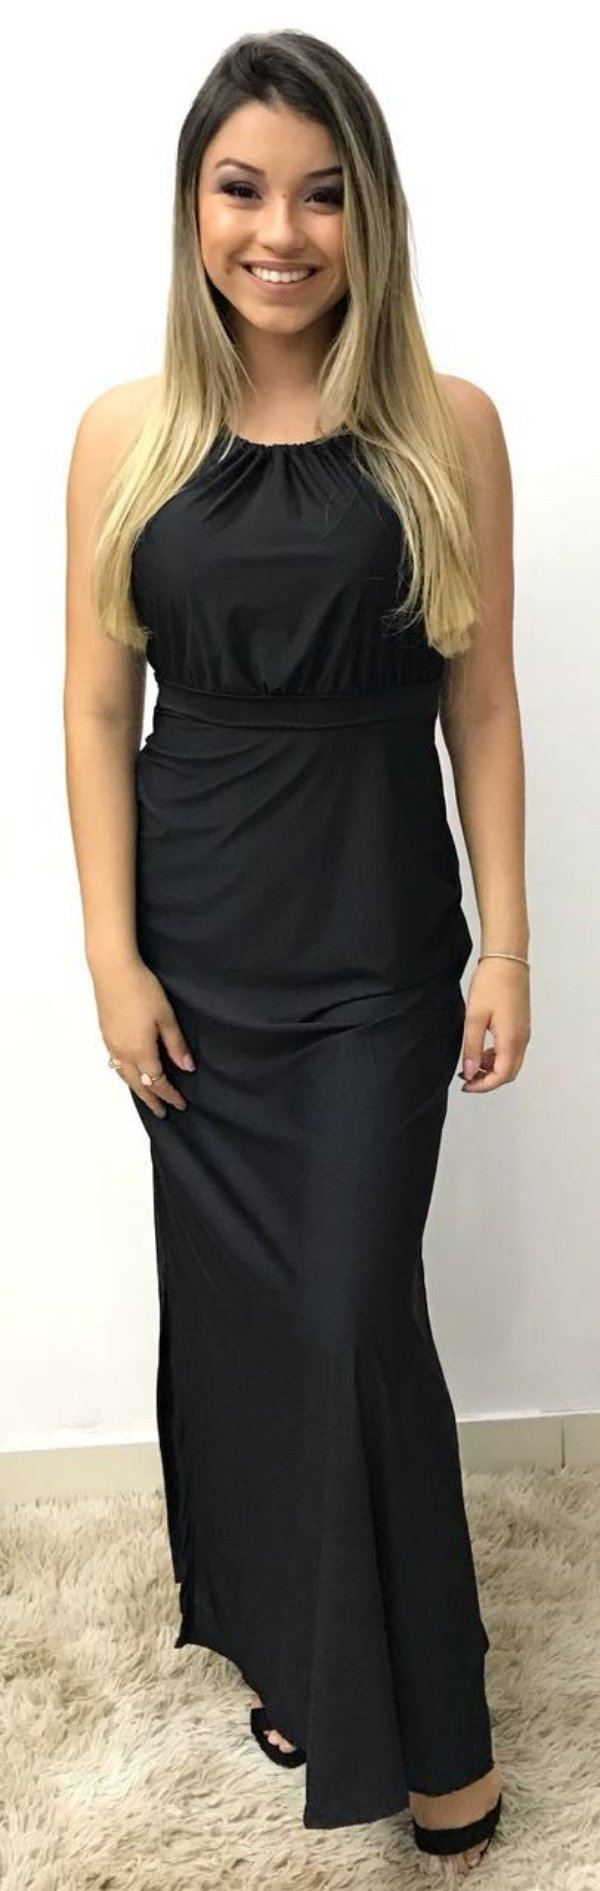 Vestgido longo preto - Patricia